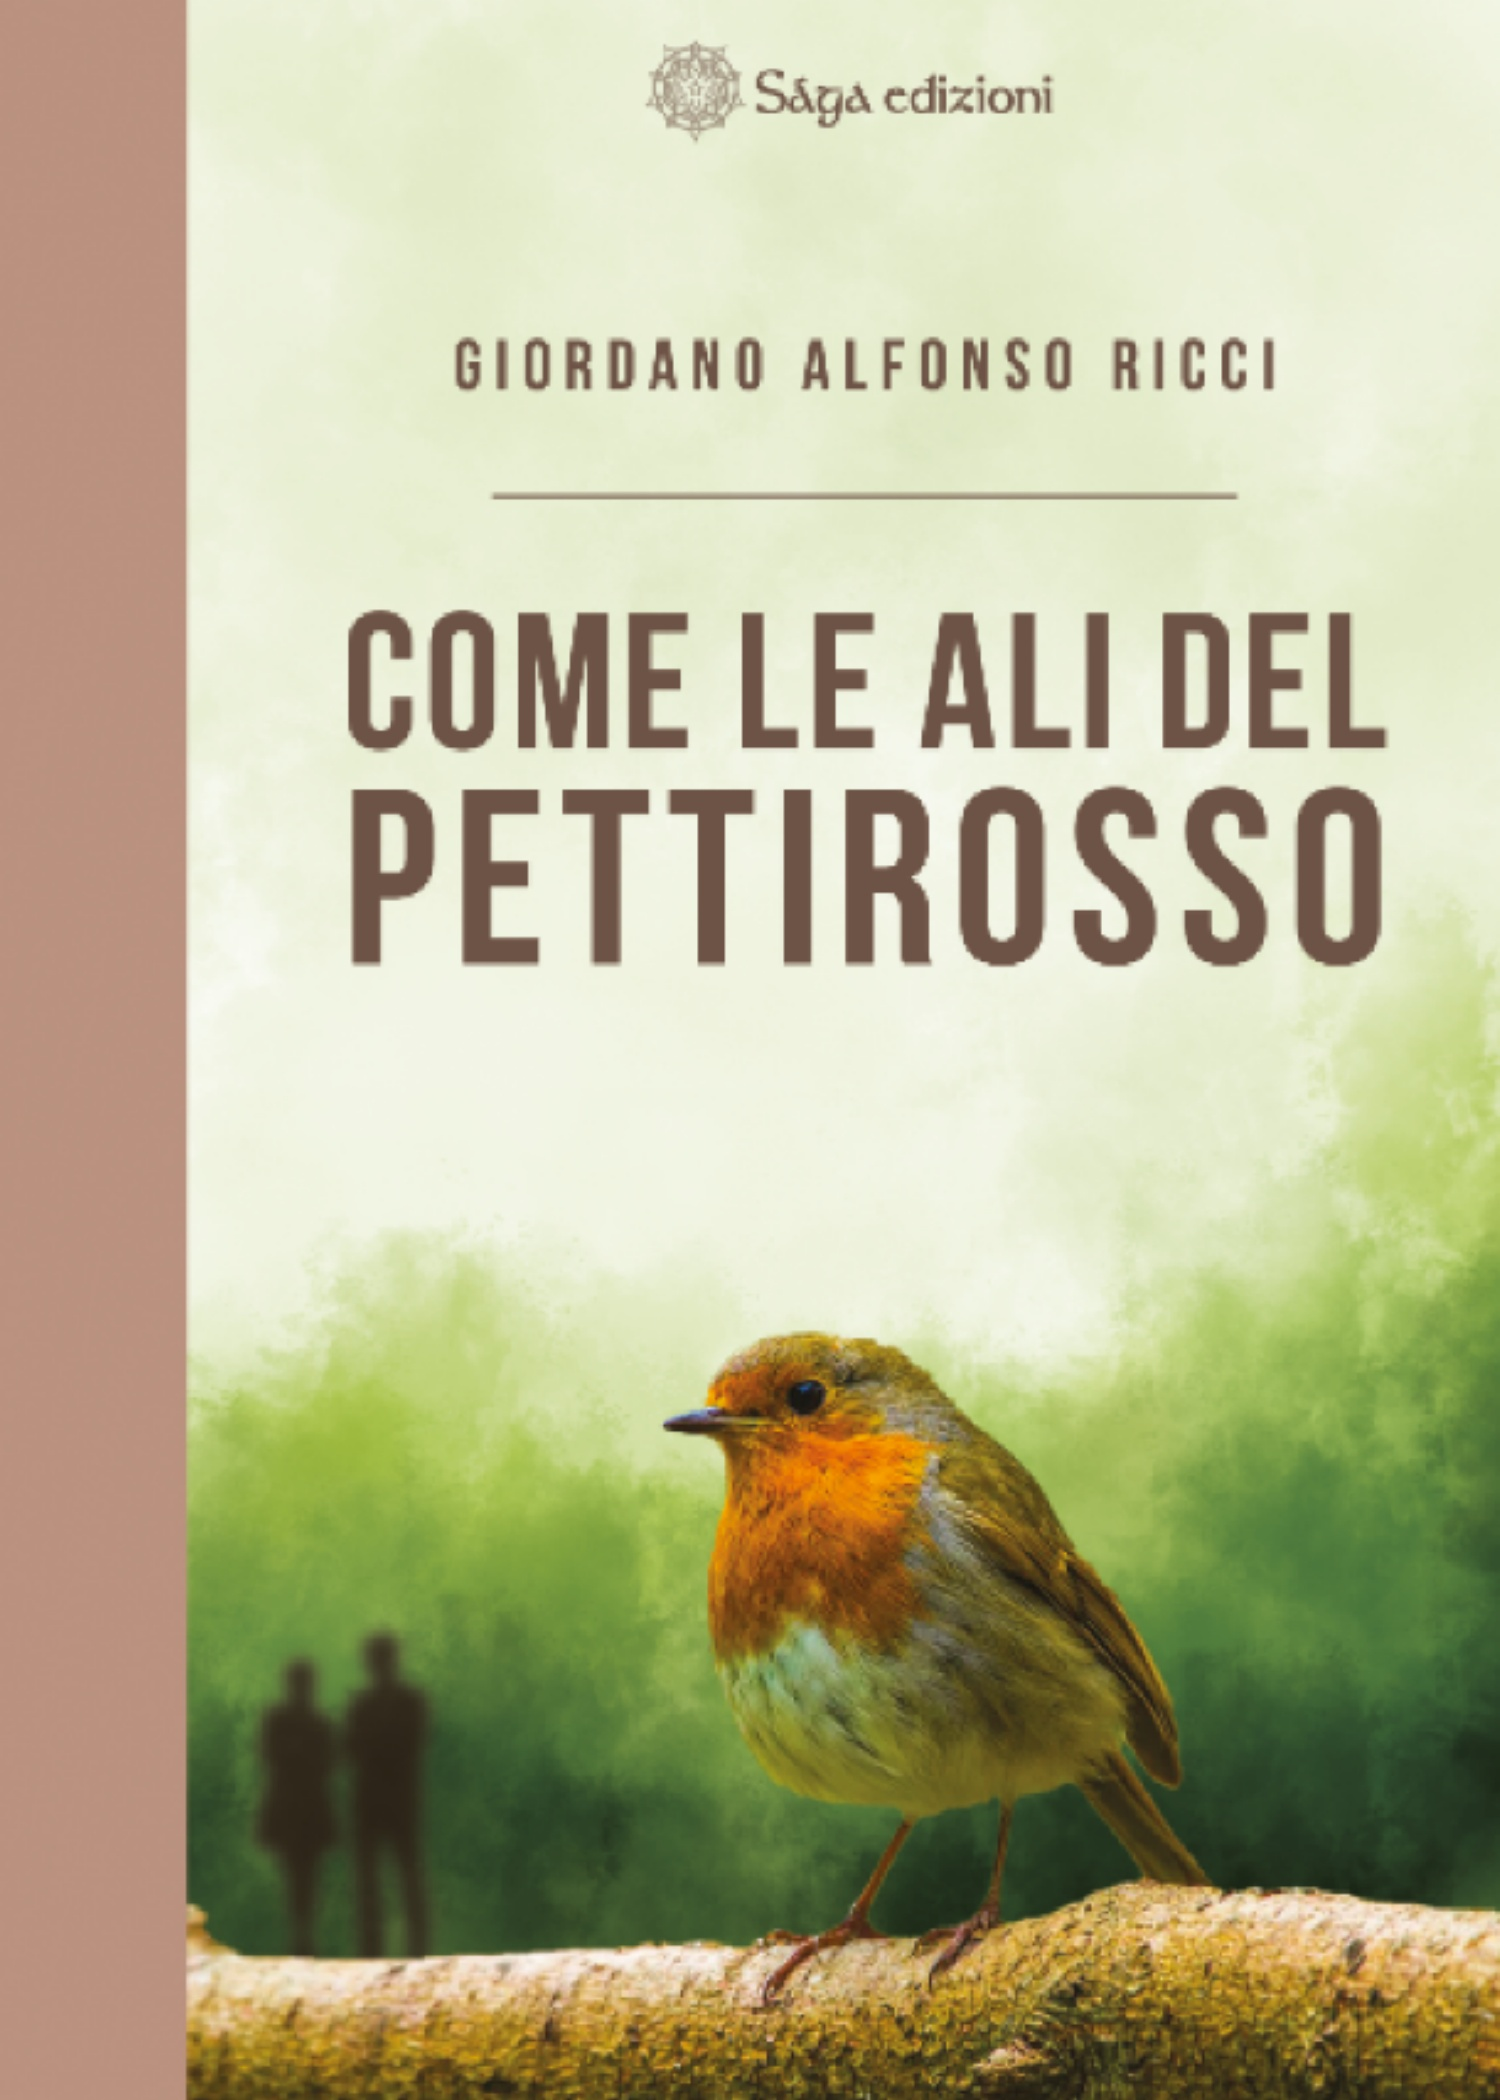 copertina_ pettirosso